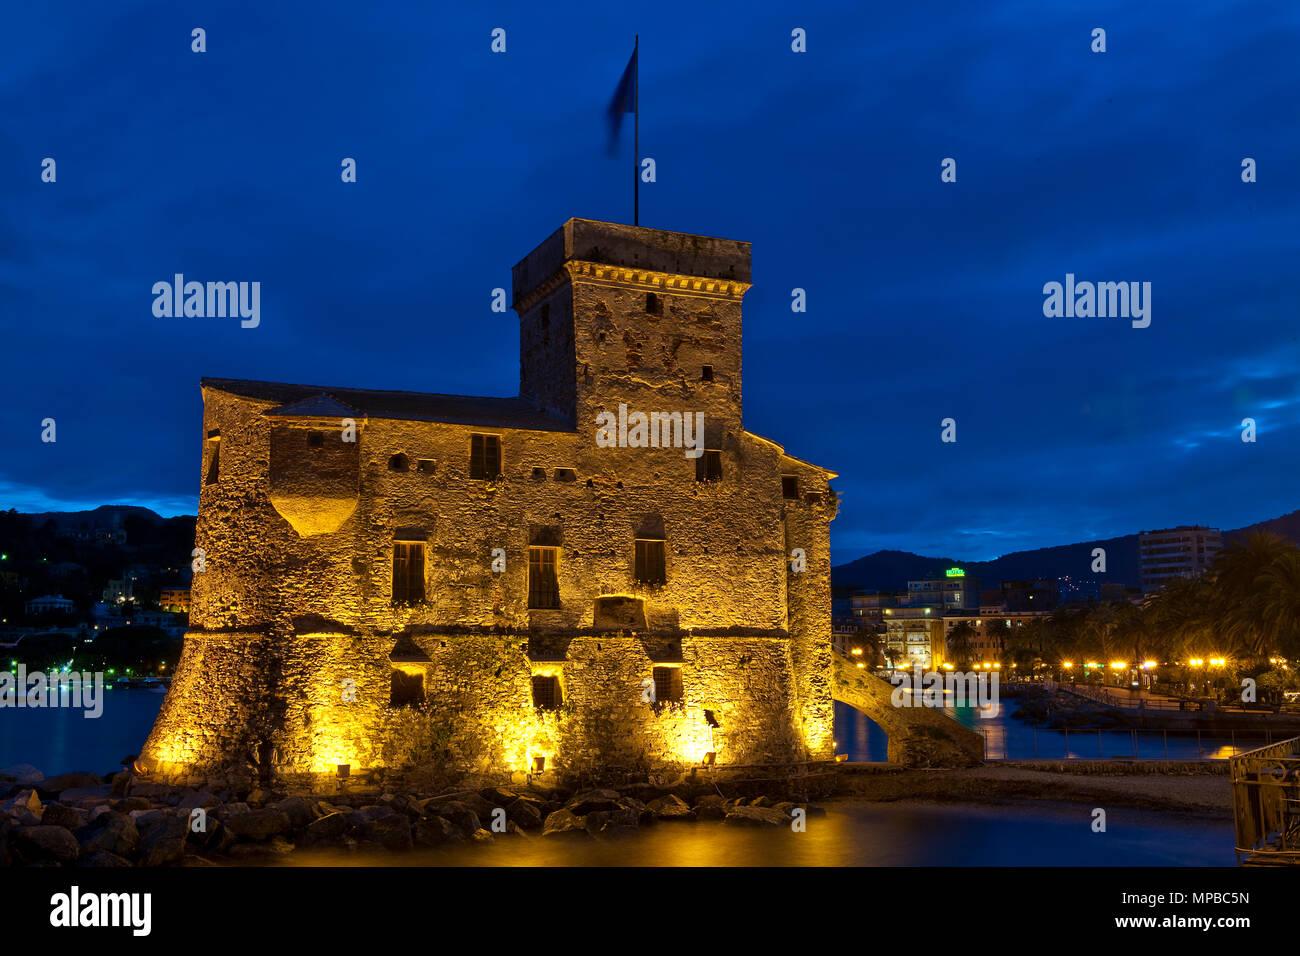 Burg erbaut im Jahre 1551, den Hafen von Rapallo, Italien   1551 erbautes Kastell, Winterkurort und Seebad Rapallo, Italien Stockbild